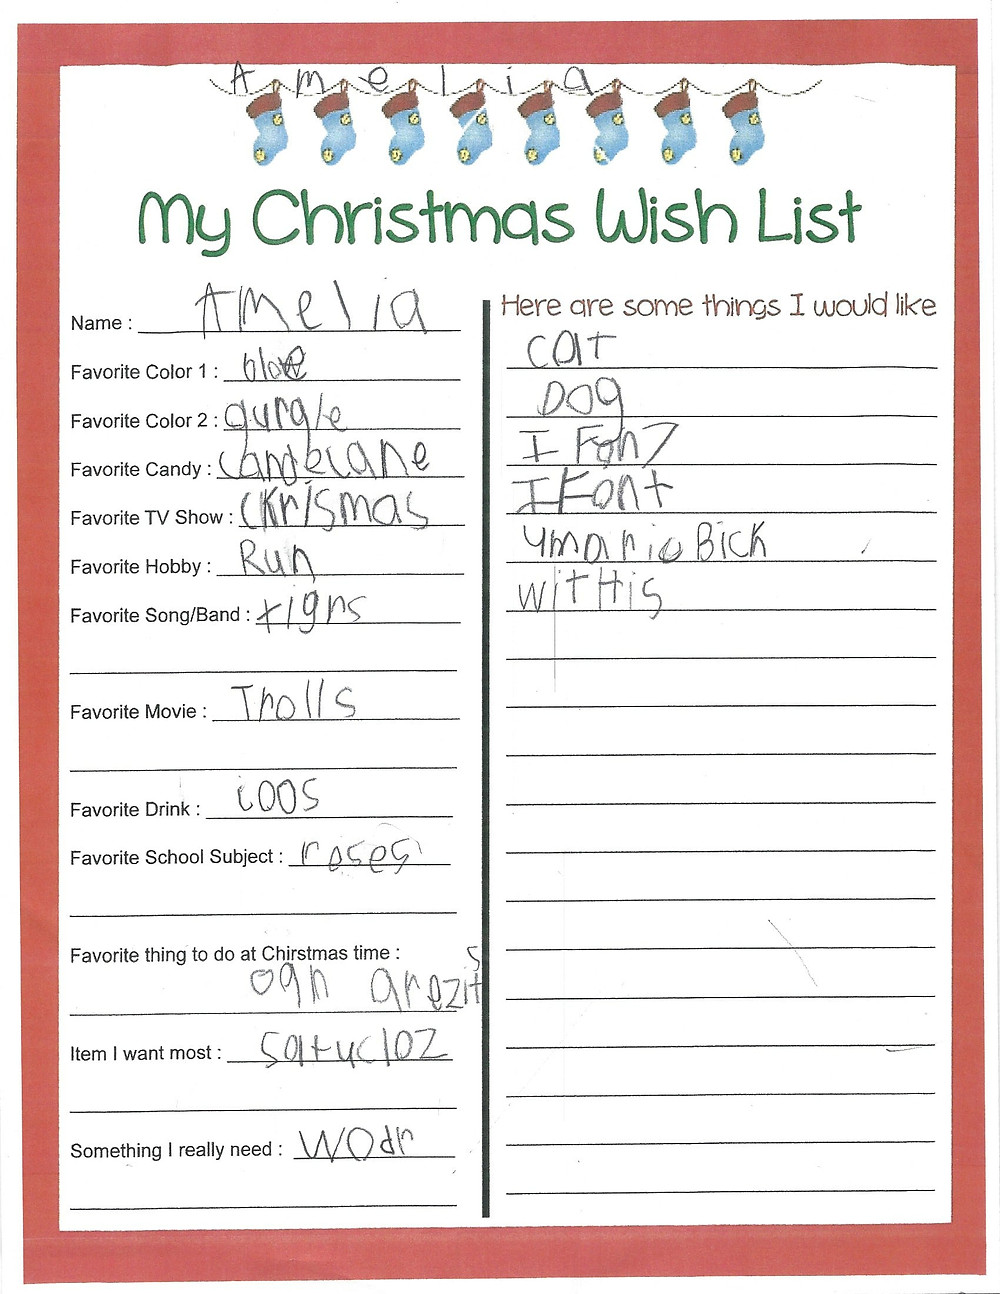 Amelia's Christmas Wish List